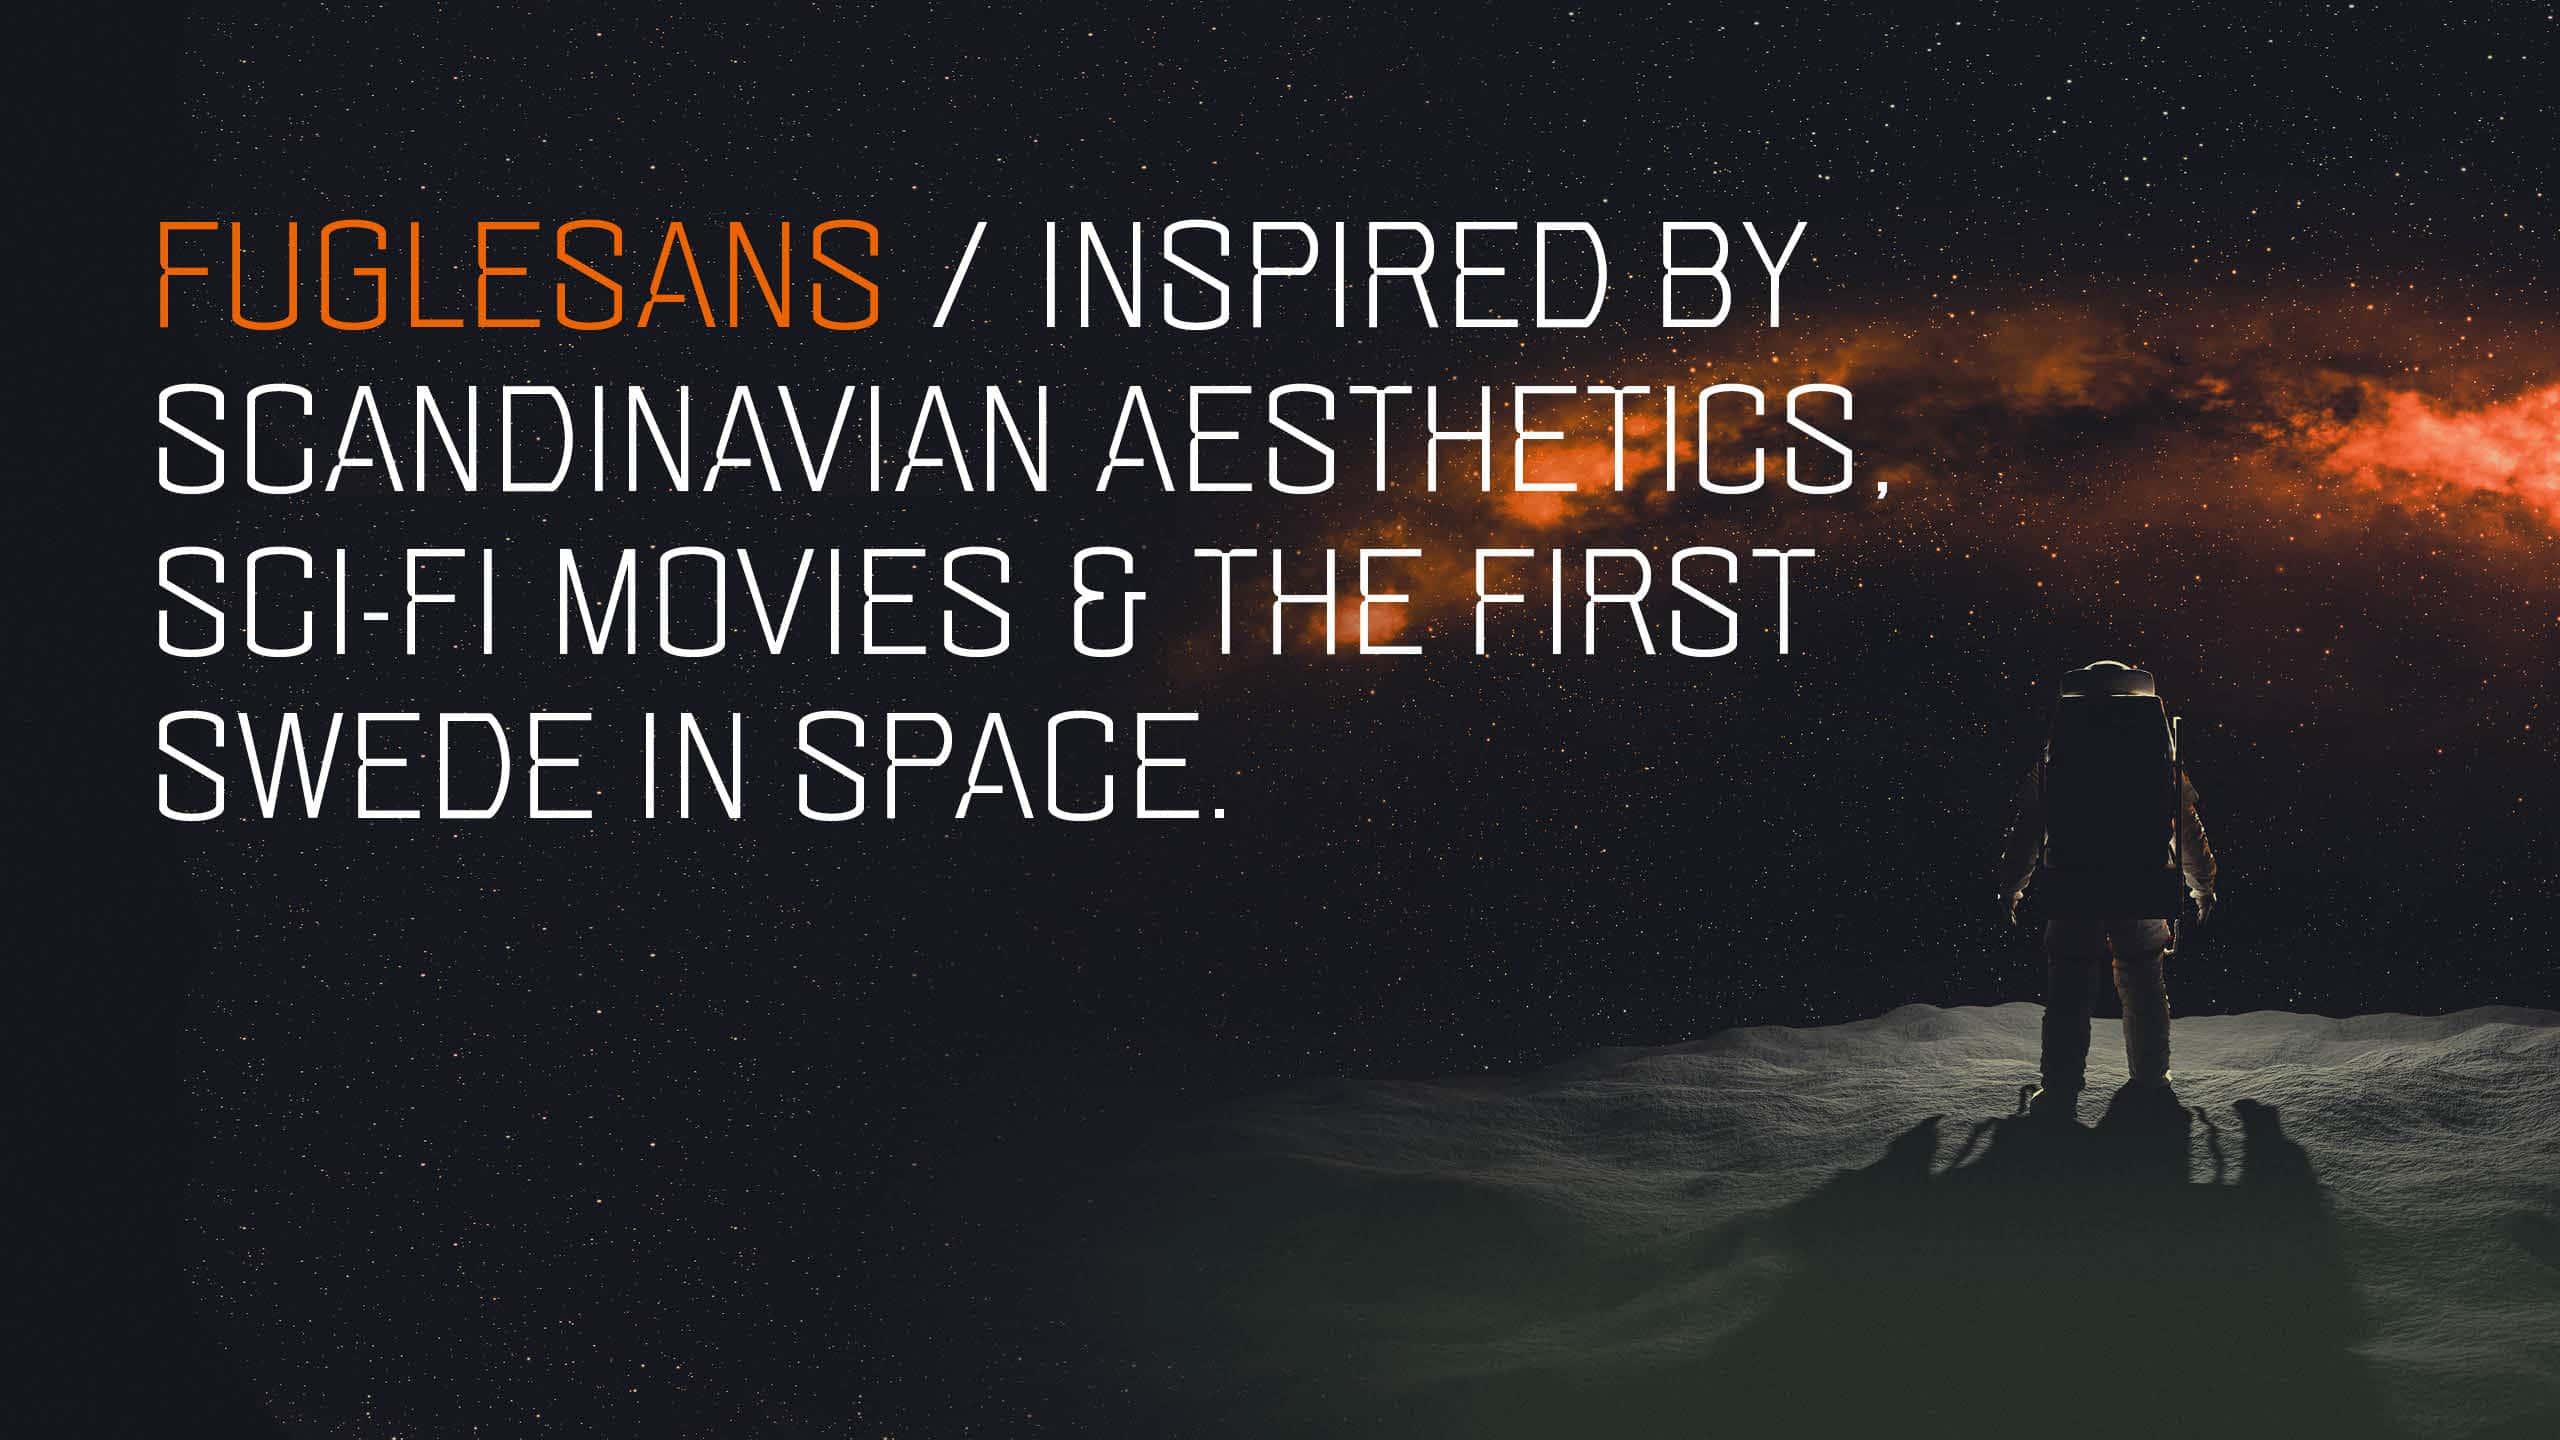 Marketing image for the font Fuglesans, background info.